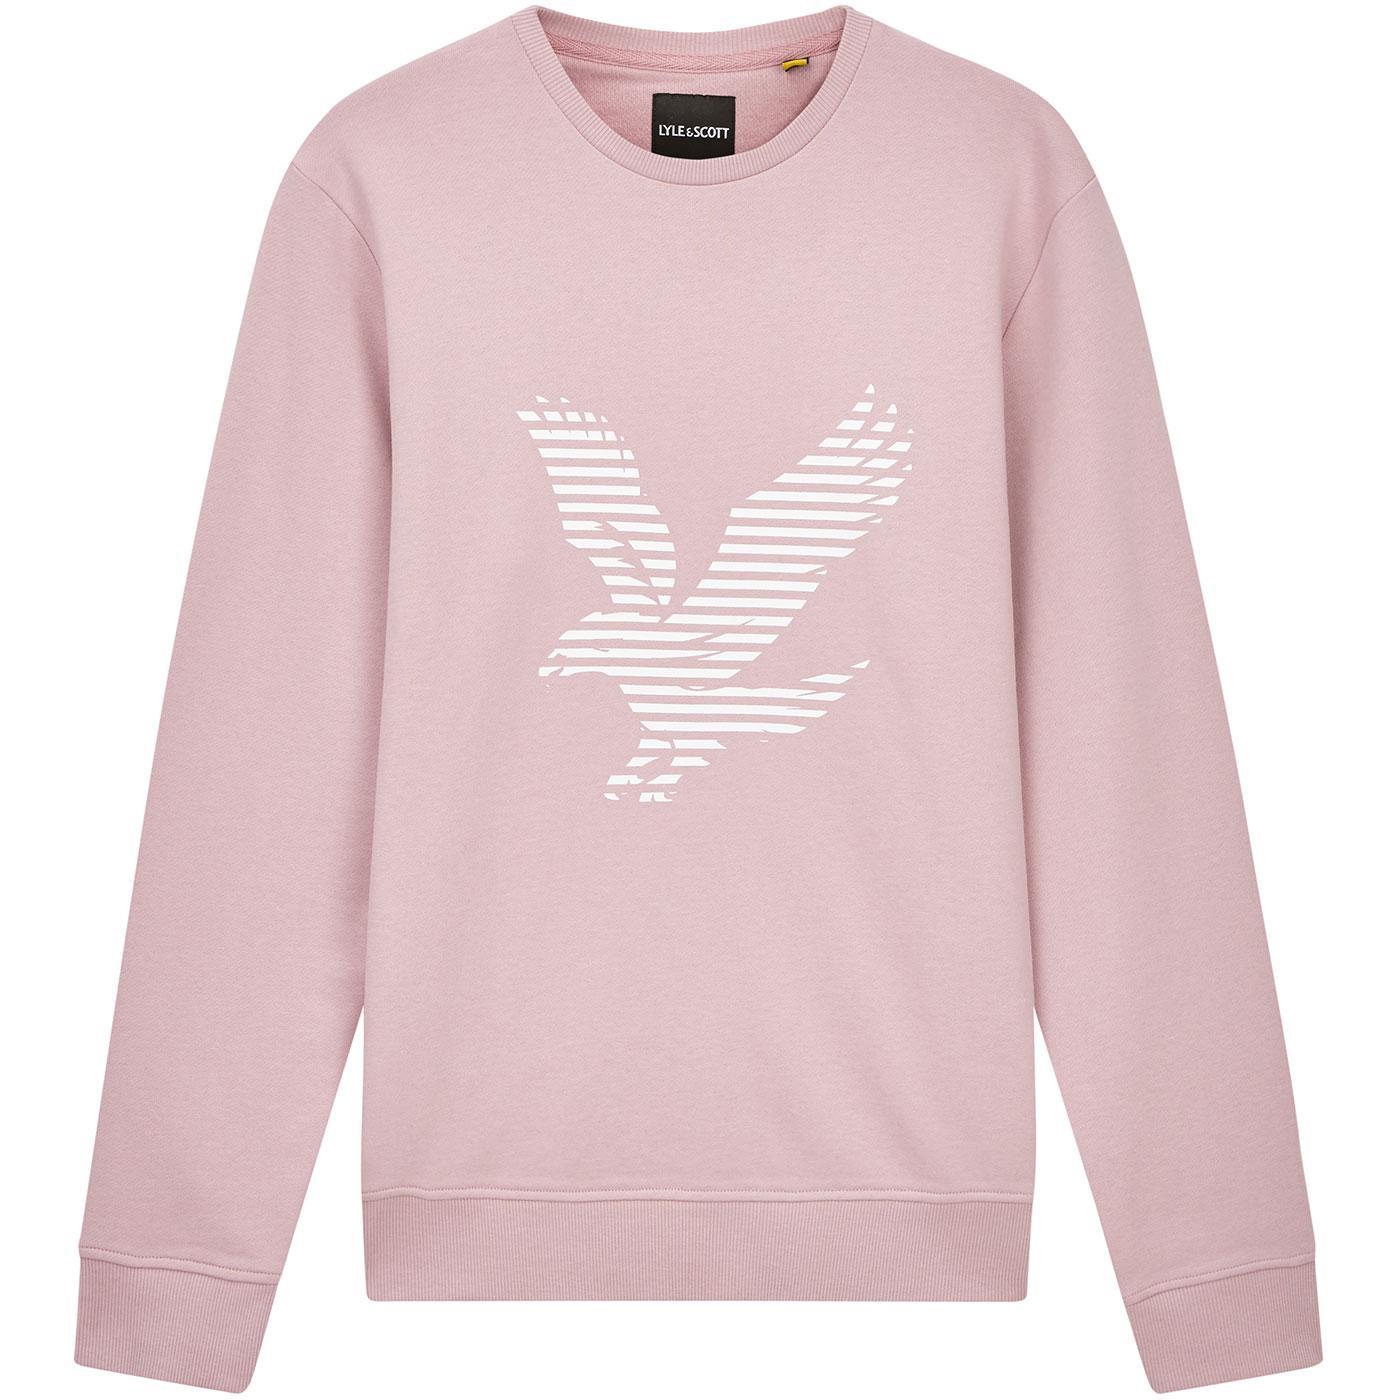 LYLE & SCOTT Retro Casuals Logo Sweatshirt (LM)